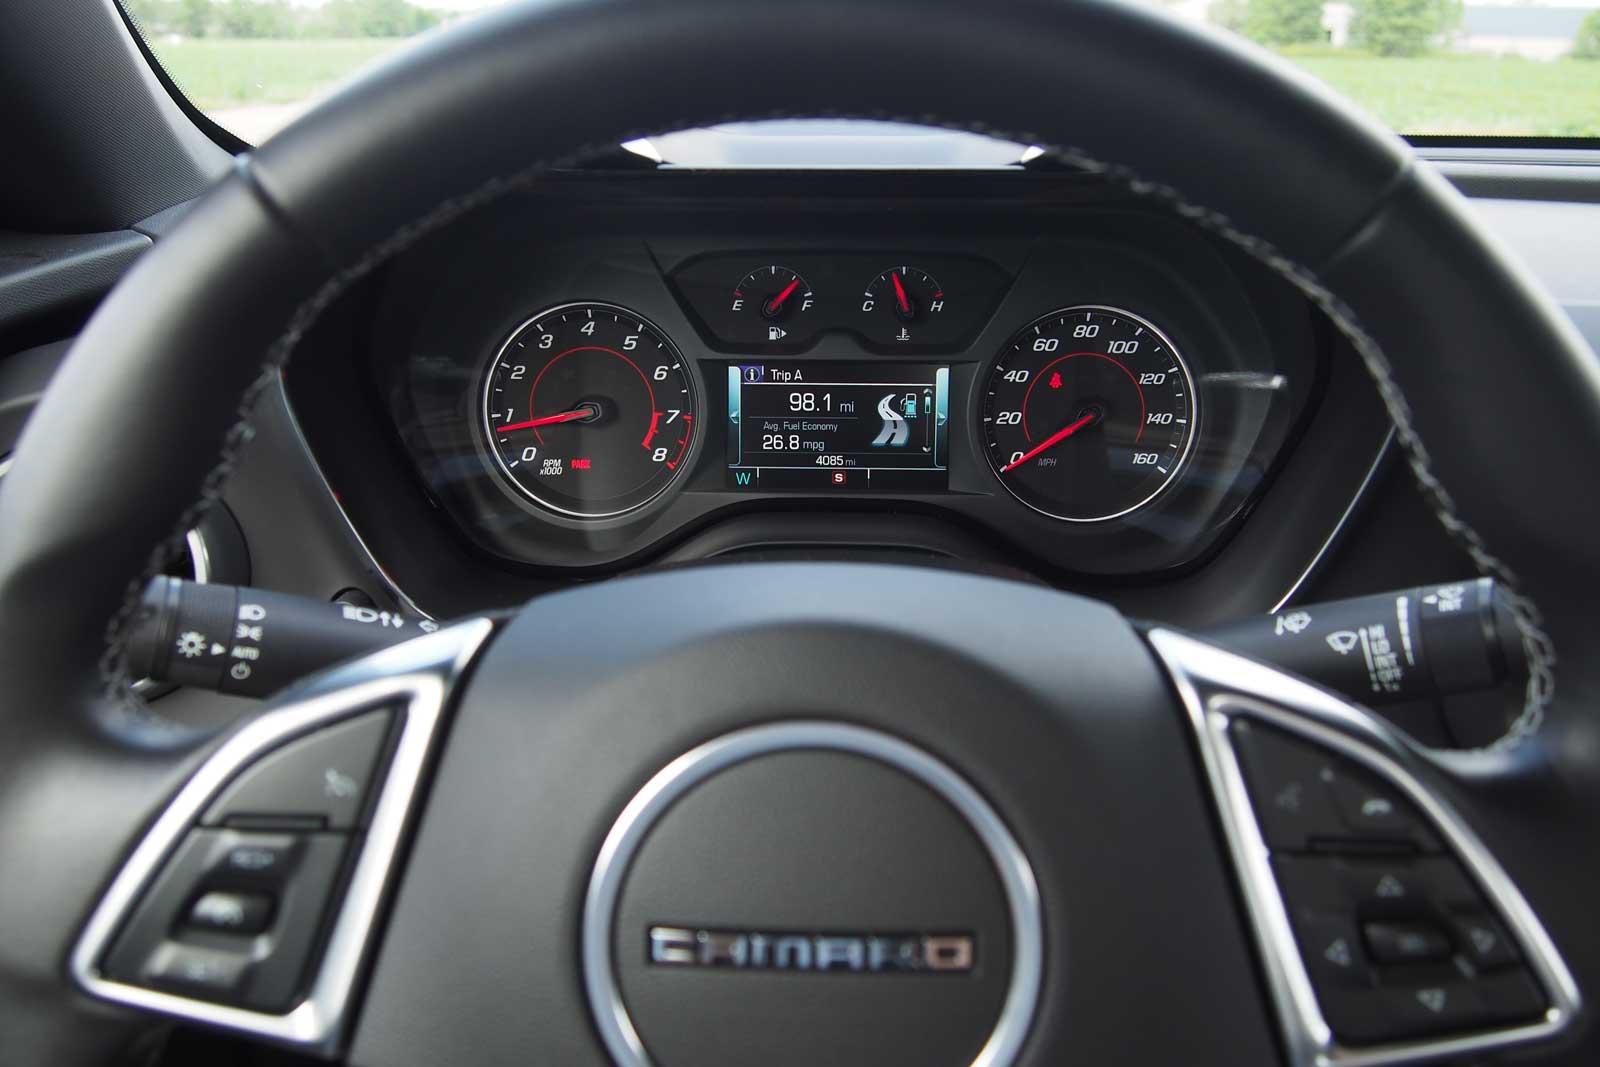 2016-Chevrolet-Camaro-1LT-Gauges-02